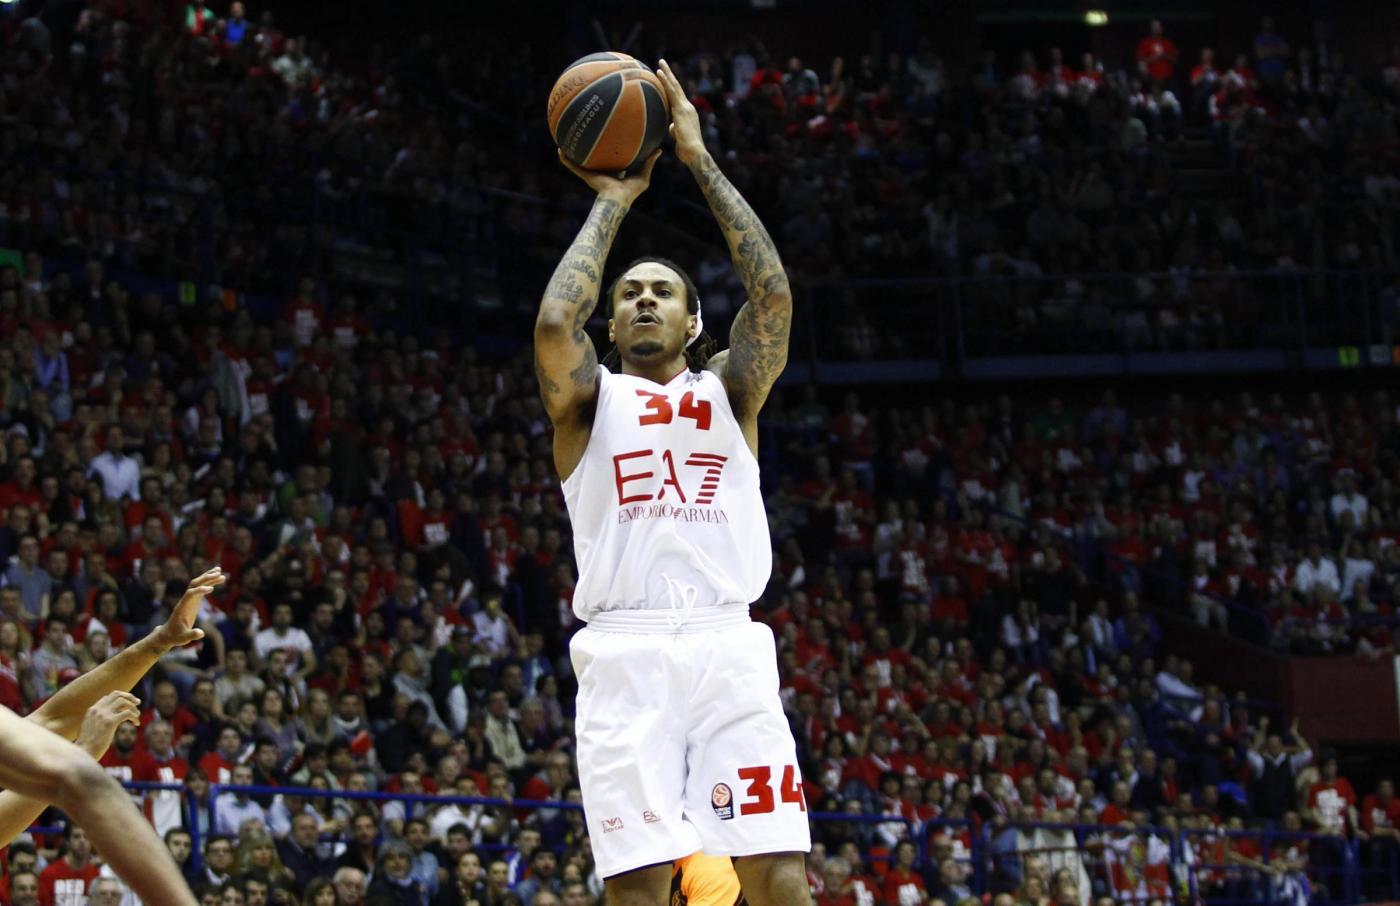 Basket, Eurolega: Armani pareggia i conti in gara-2